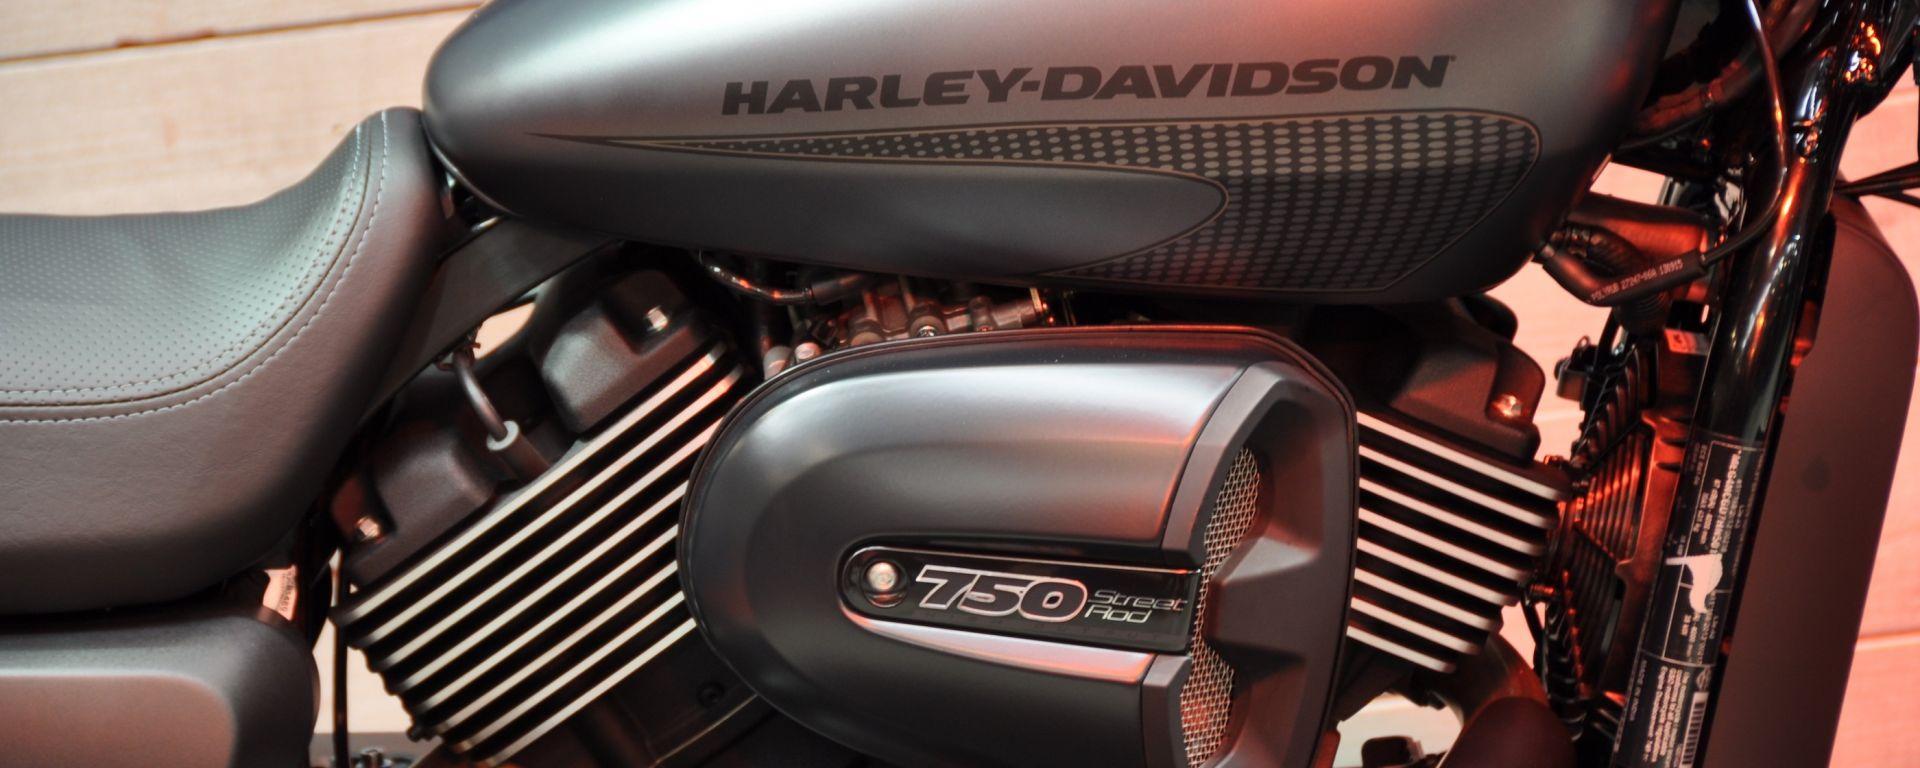 Harley-Davidson Street Rod 2017: ecco la 750 da 8.700 euro